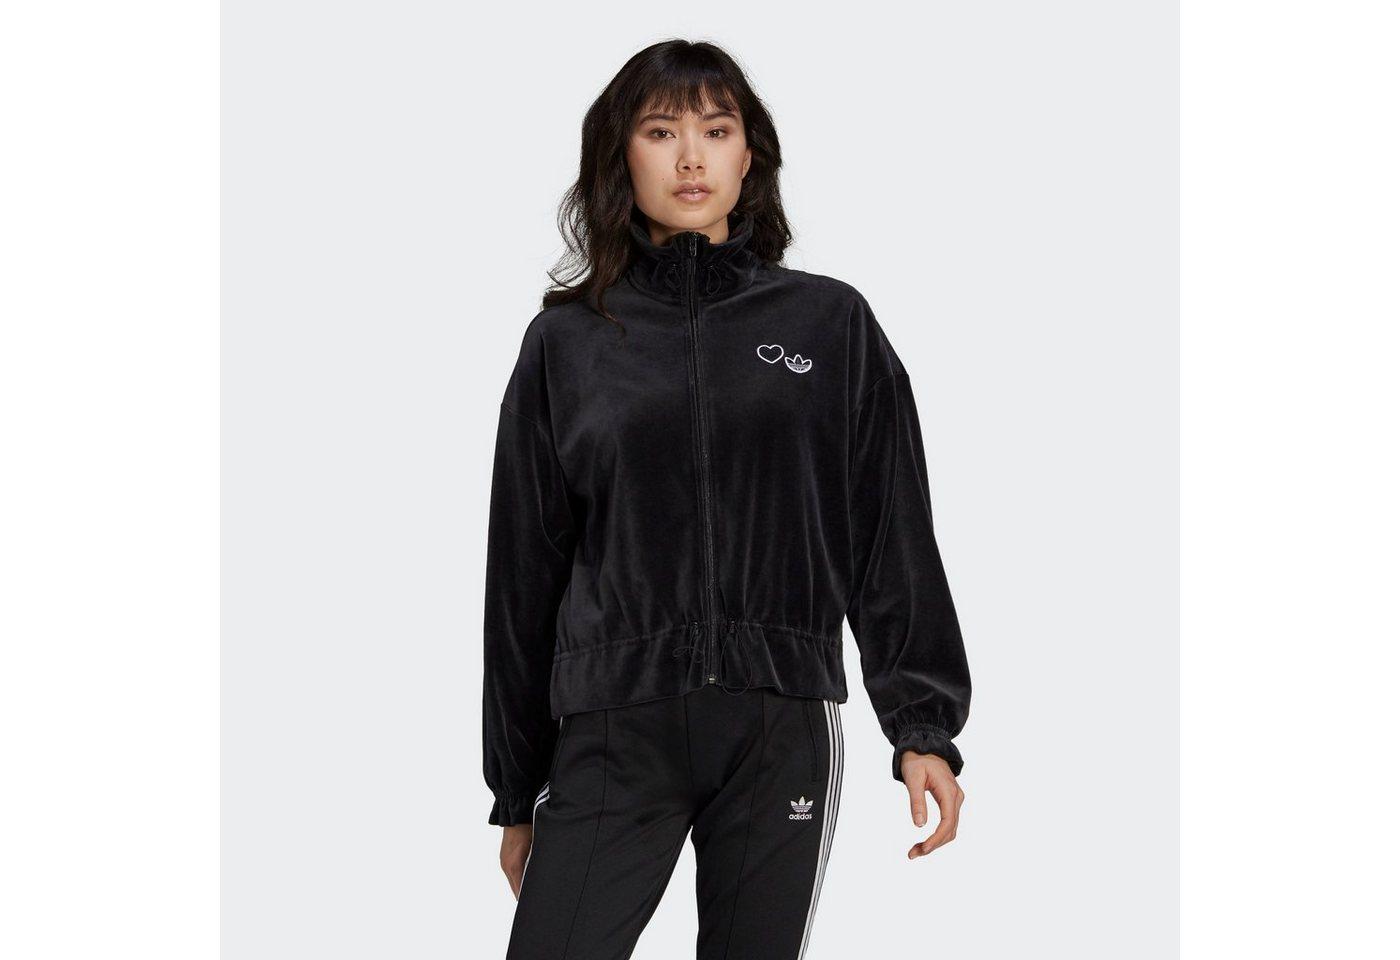 Sportmode - adidas Originals Trainingsanzug »Originals Jacke« › schwarz  - Onlineshop OTTO